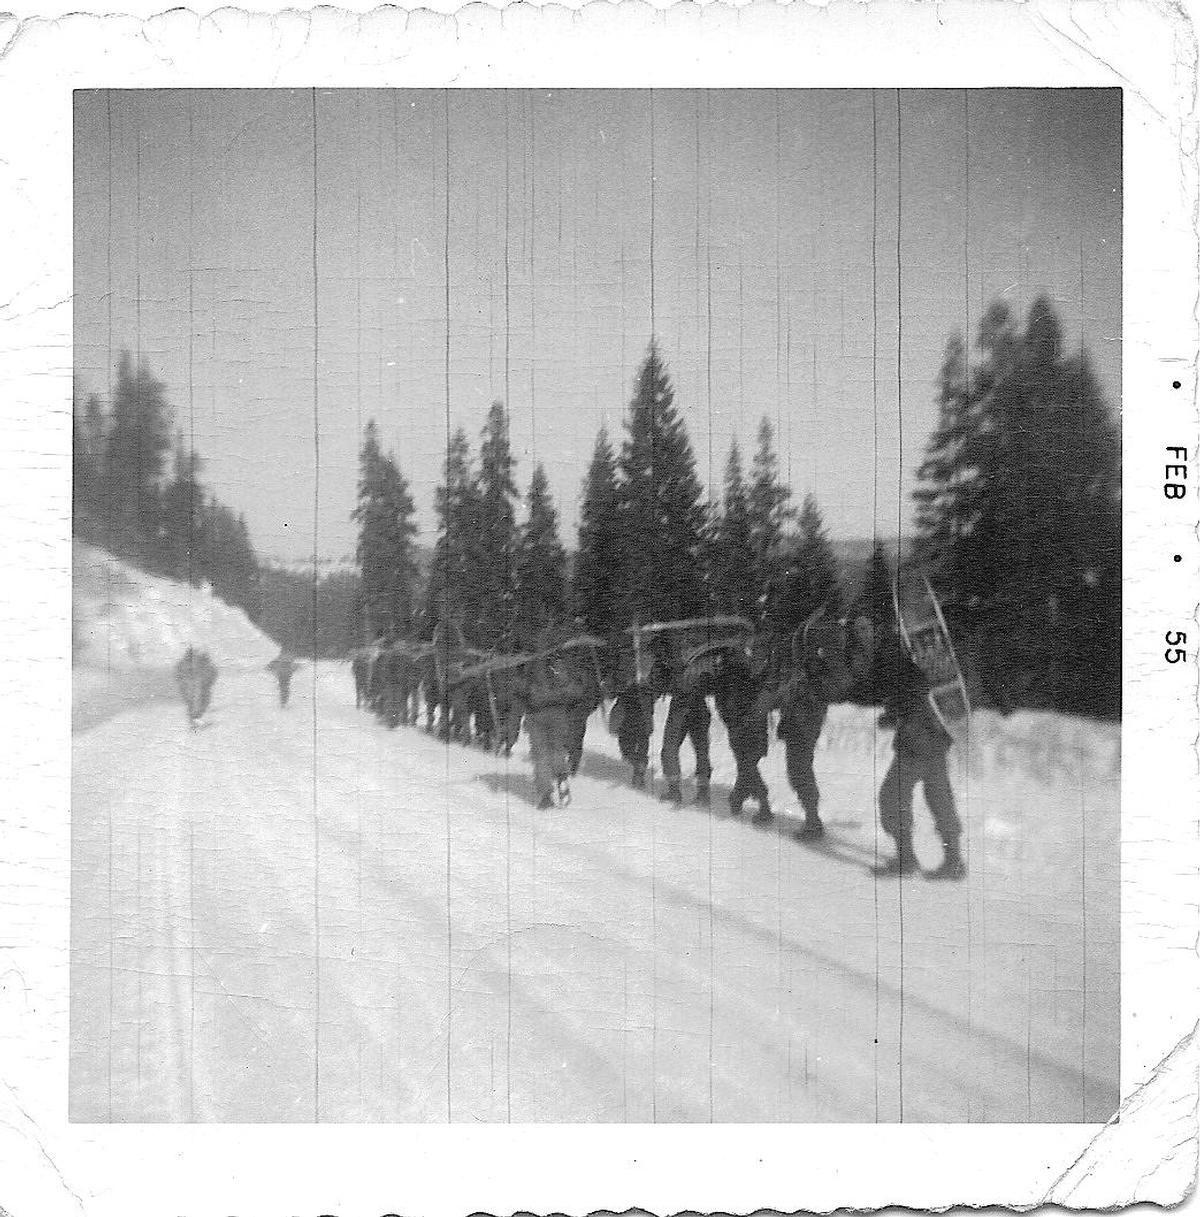 Combat Survival Training, Stead AFB, 195455. Strategic